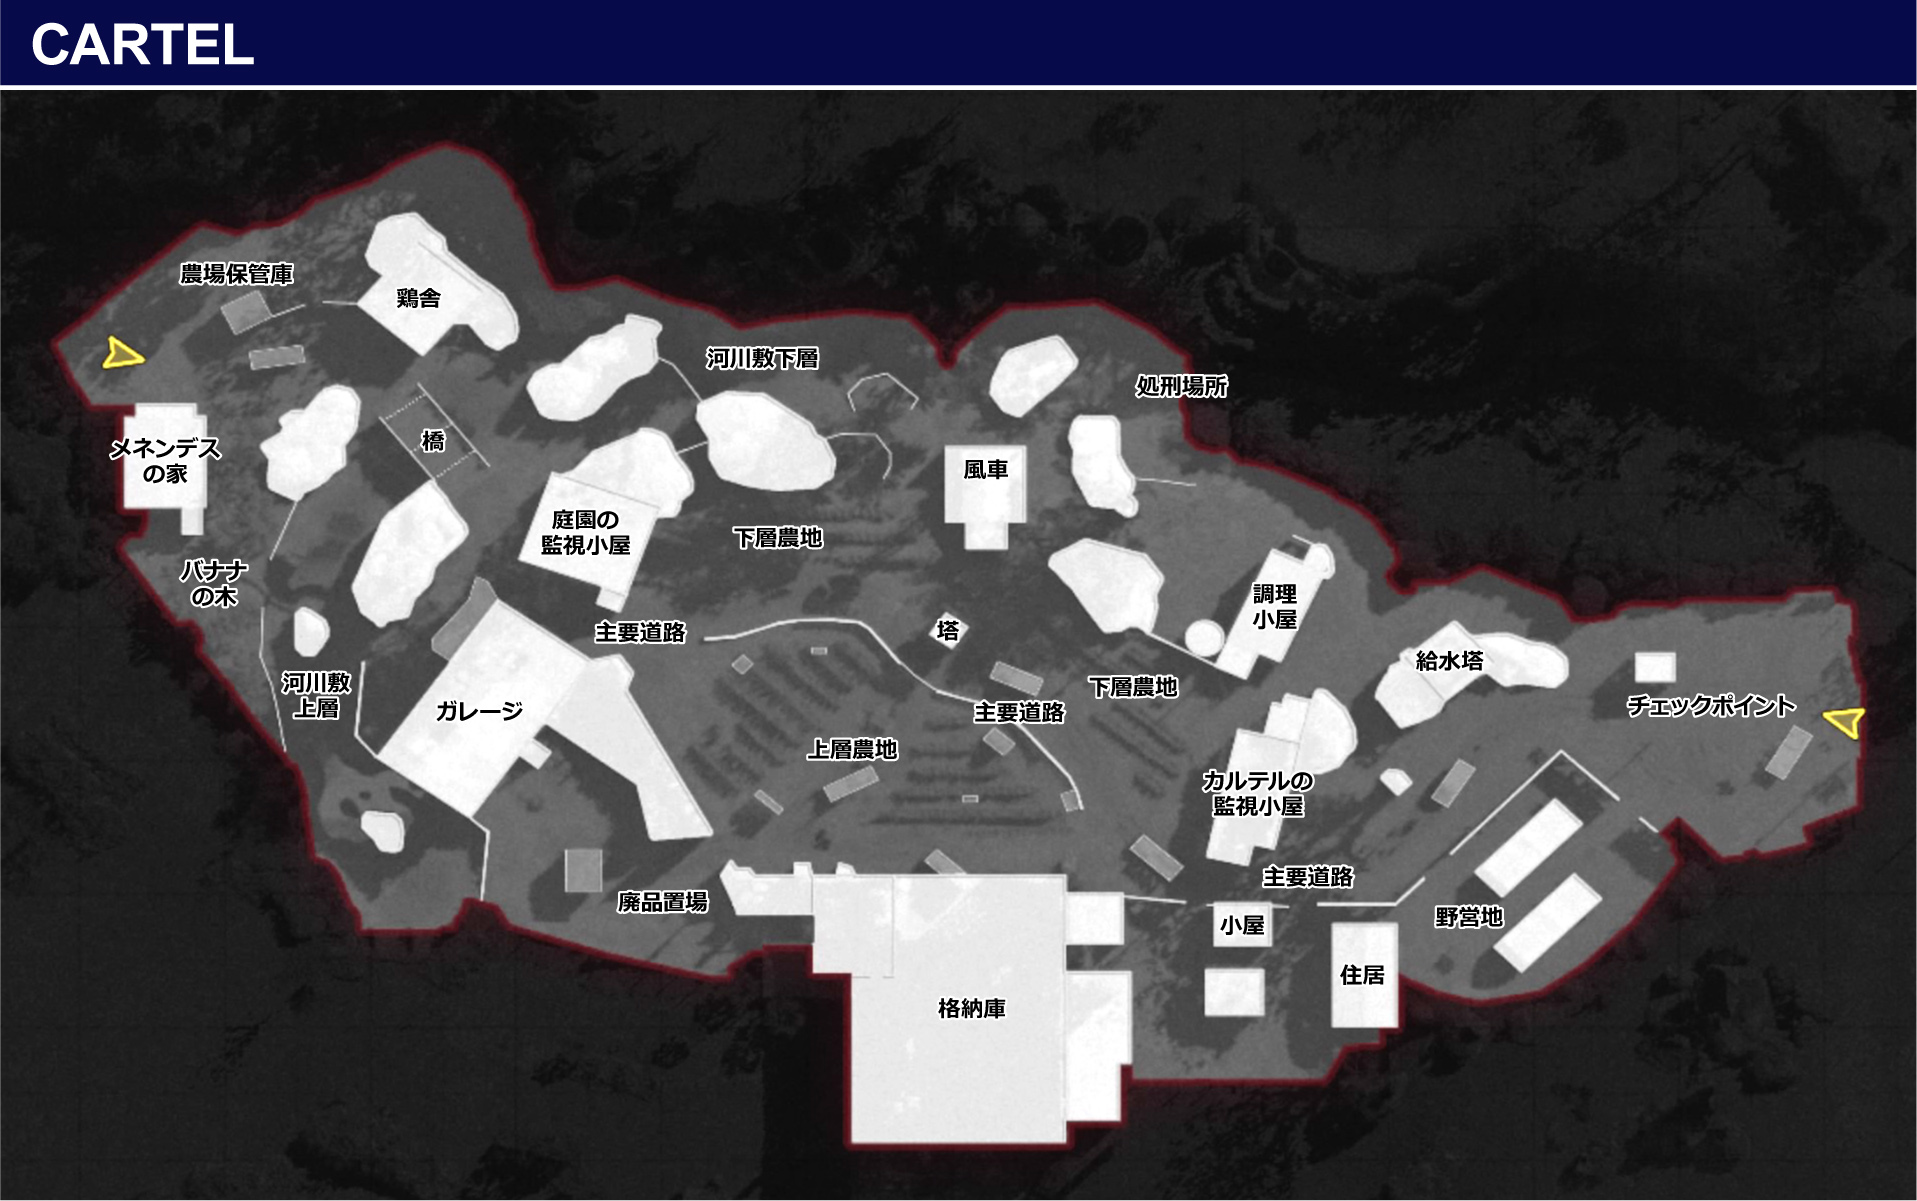 CARTEL-map